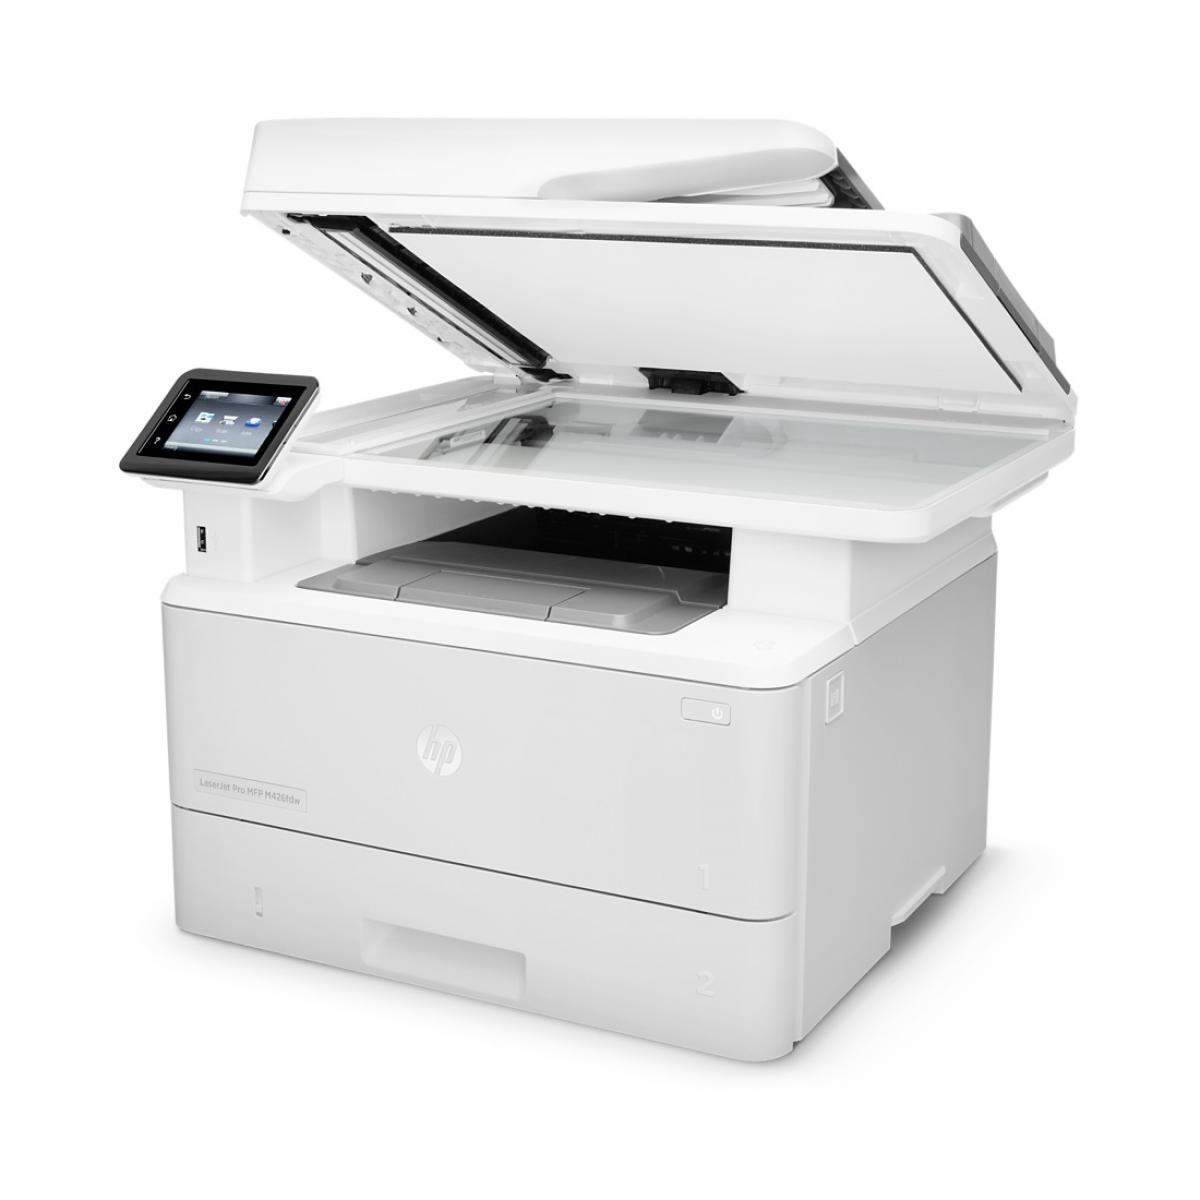 Printer-3